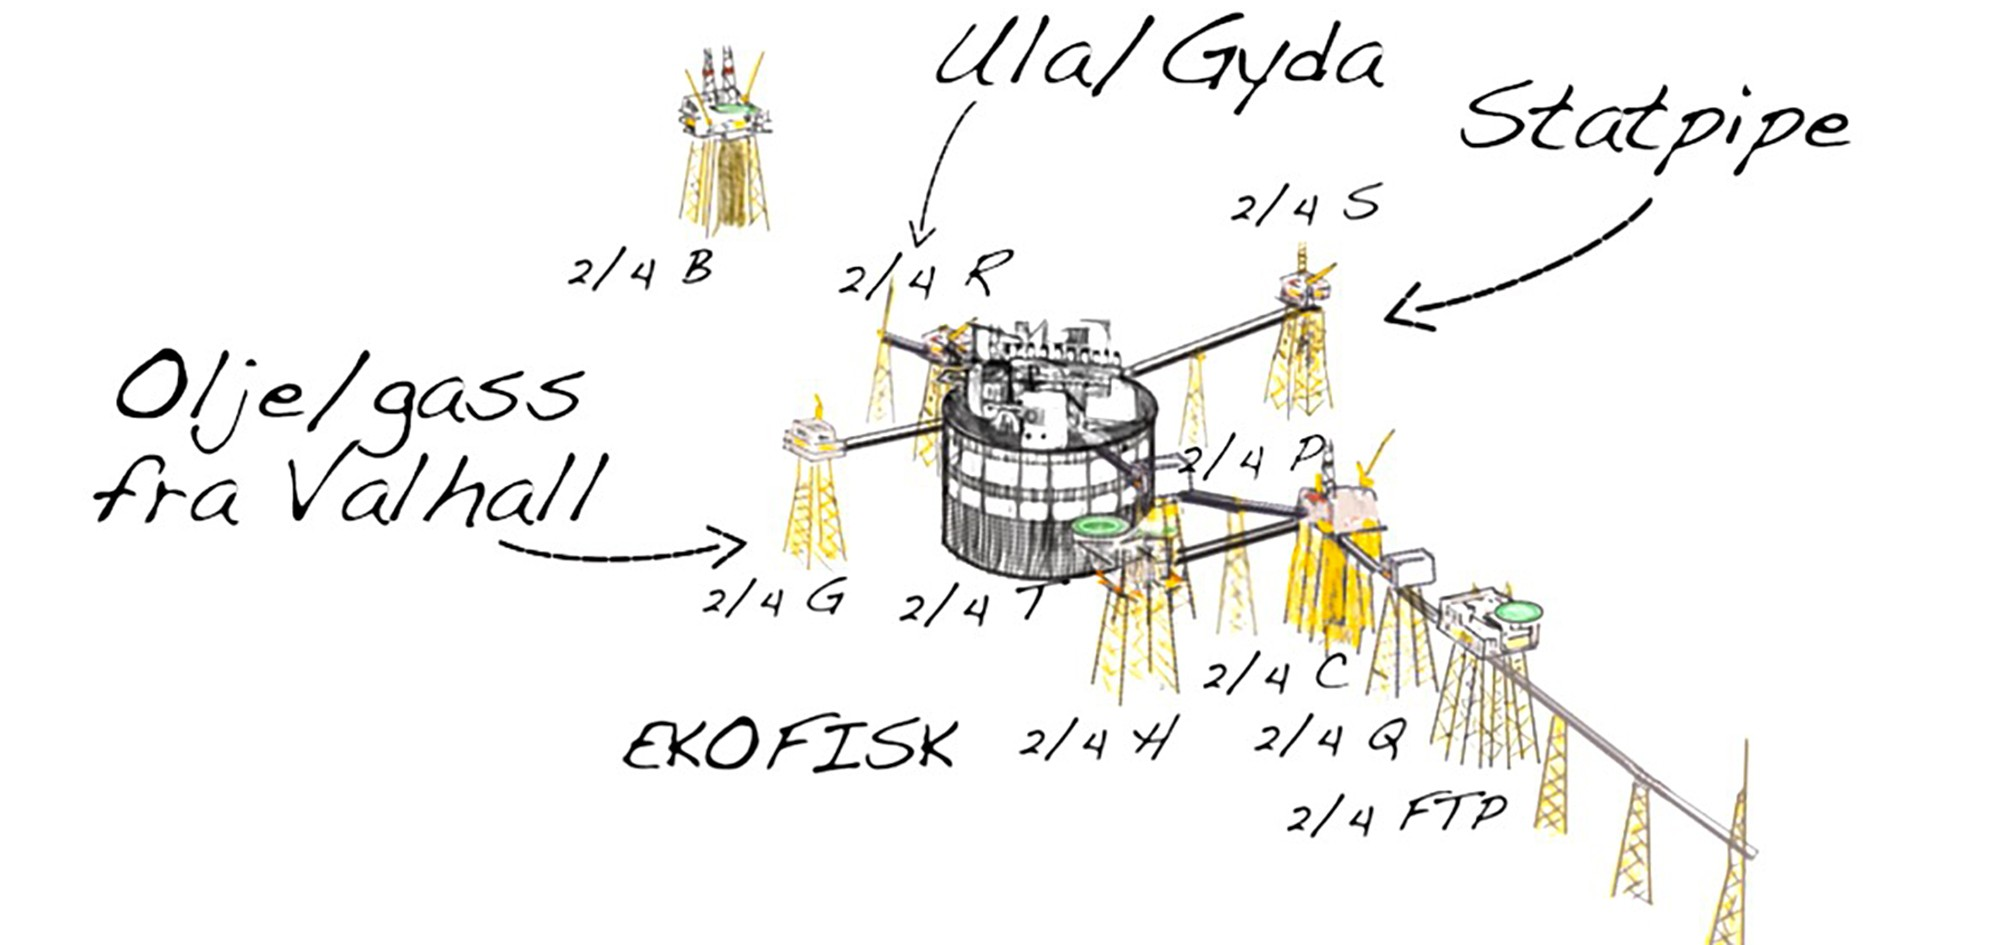 Sketch of Ekofisk platform